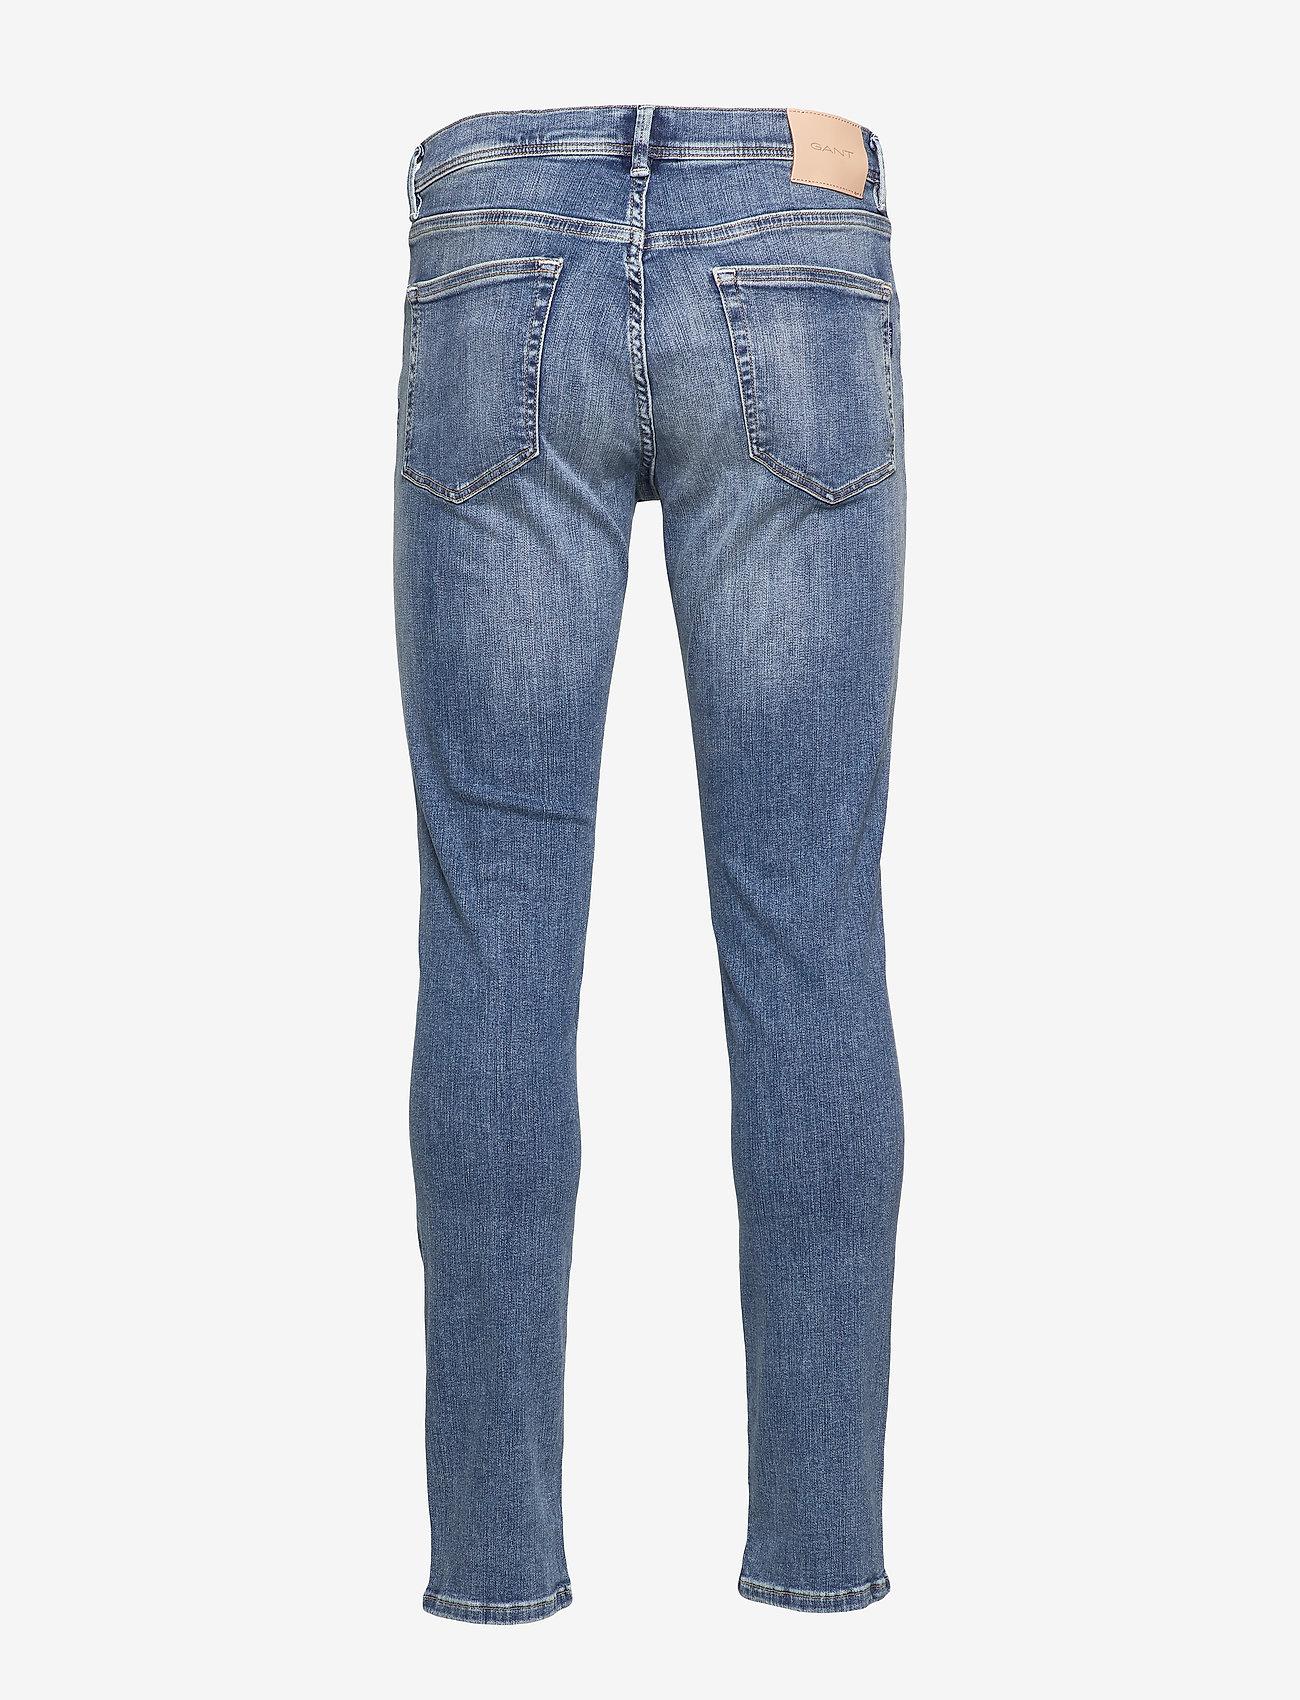 GANT - D1. SLIM ACTIVE-RECOVER JEANS - slim jeans - mid blue vintage - 1